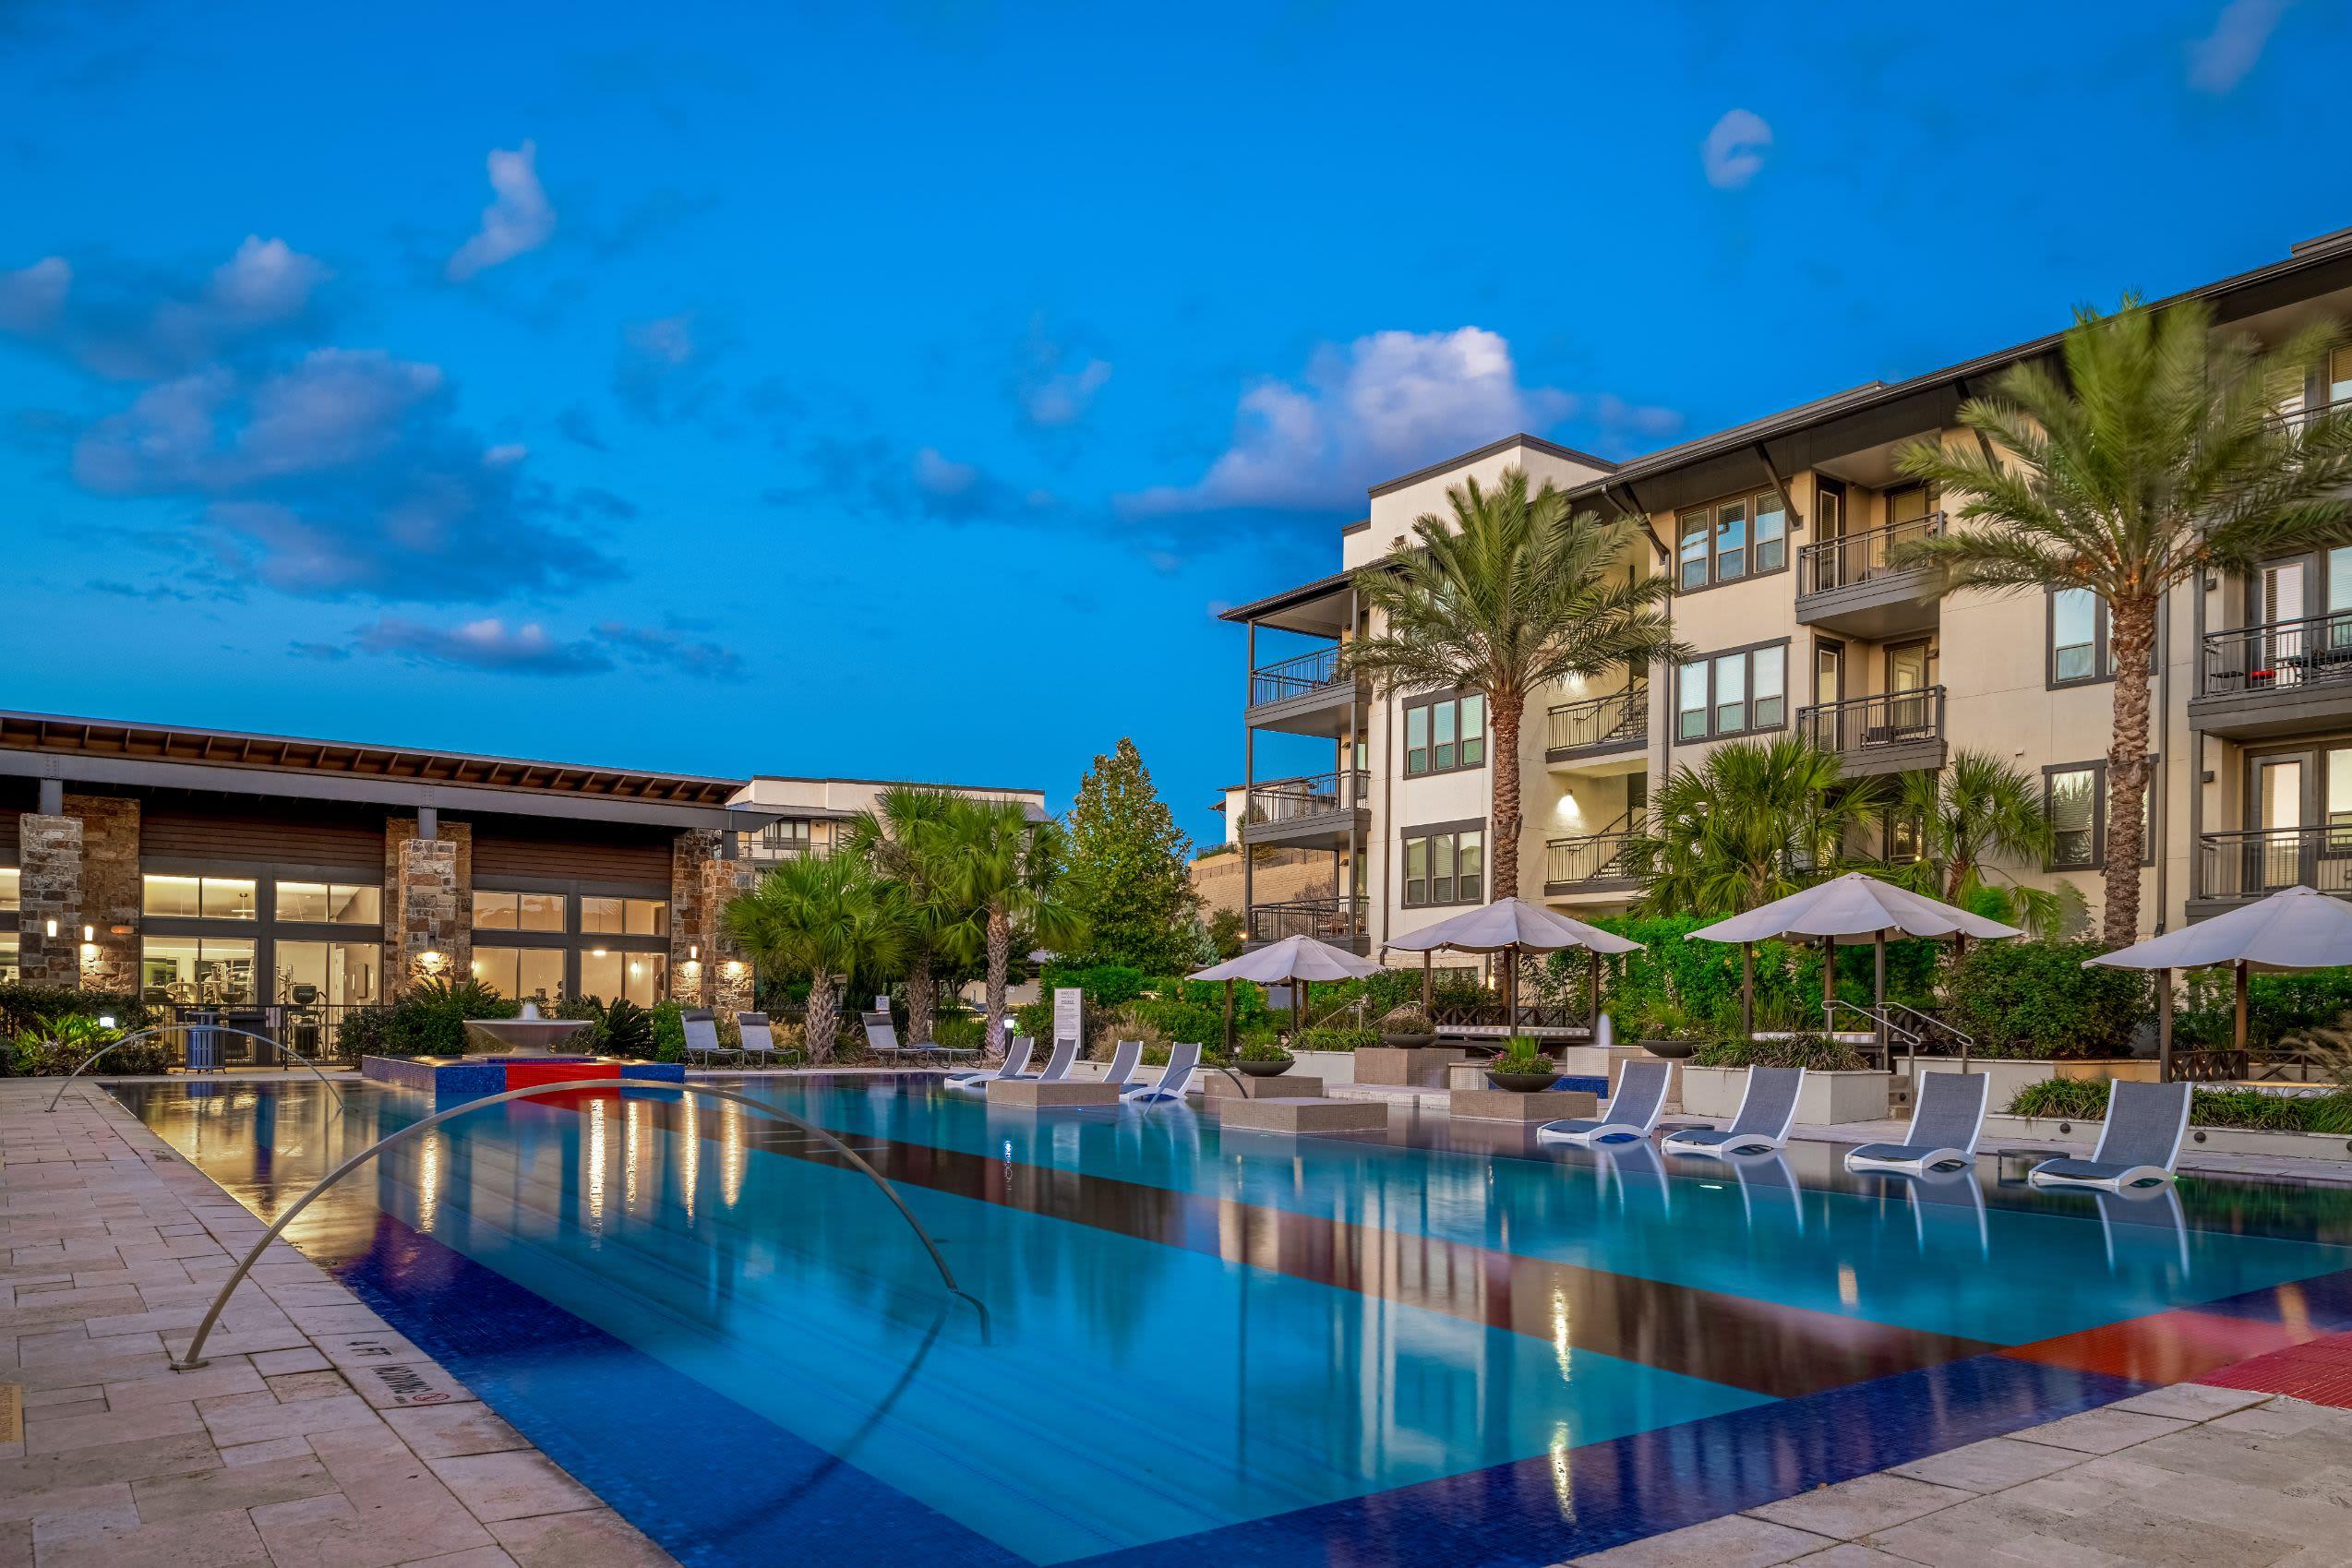 Resort-style swimming pool at Marquis Cresta Bella in San Antonio, Texas